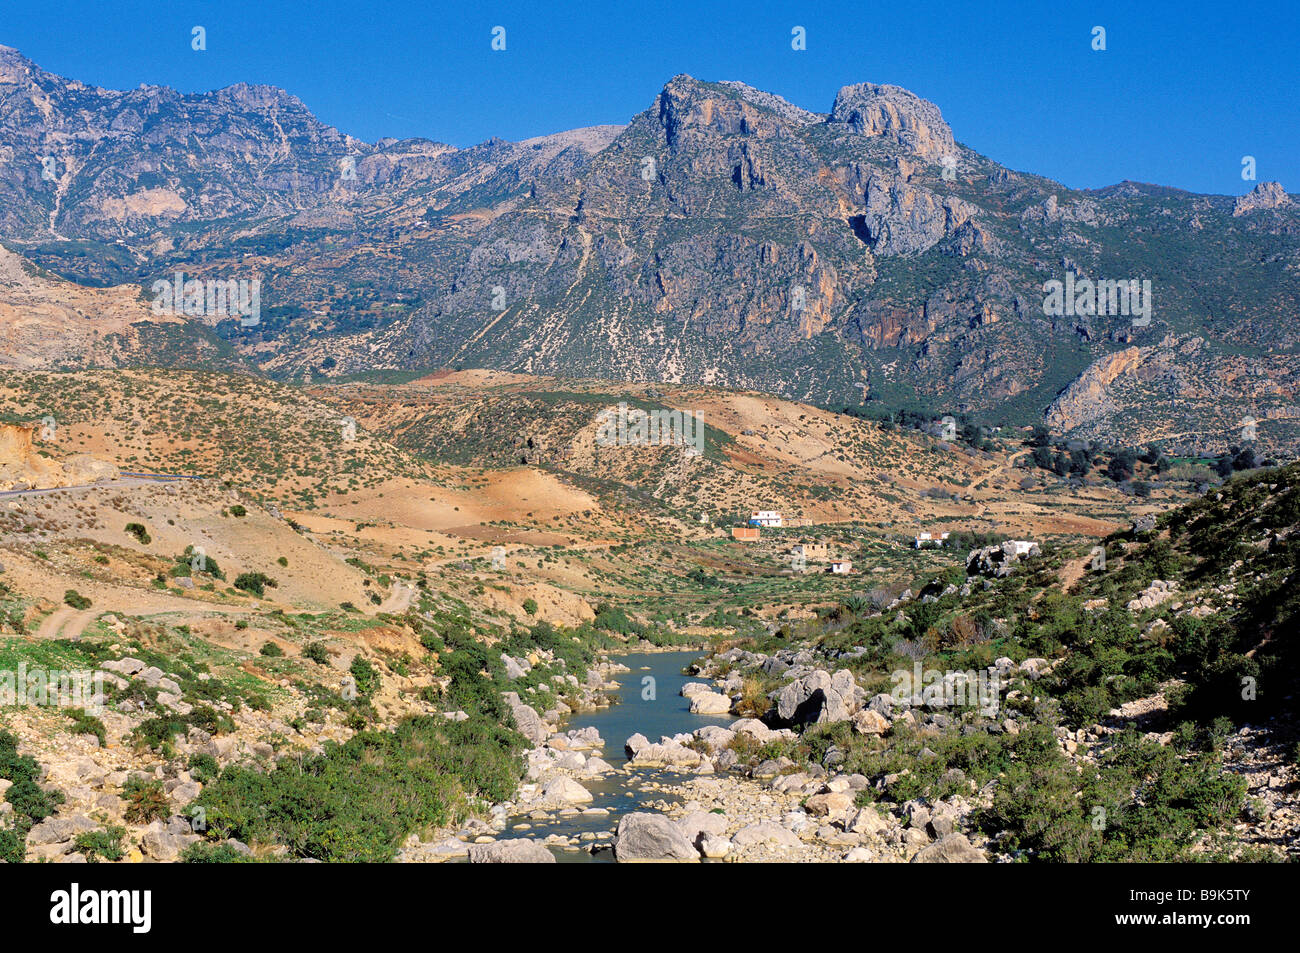 Morocco Landscape Mountains